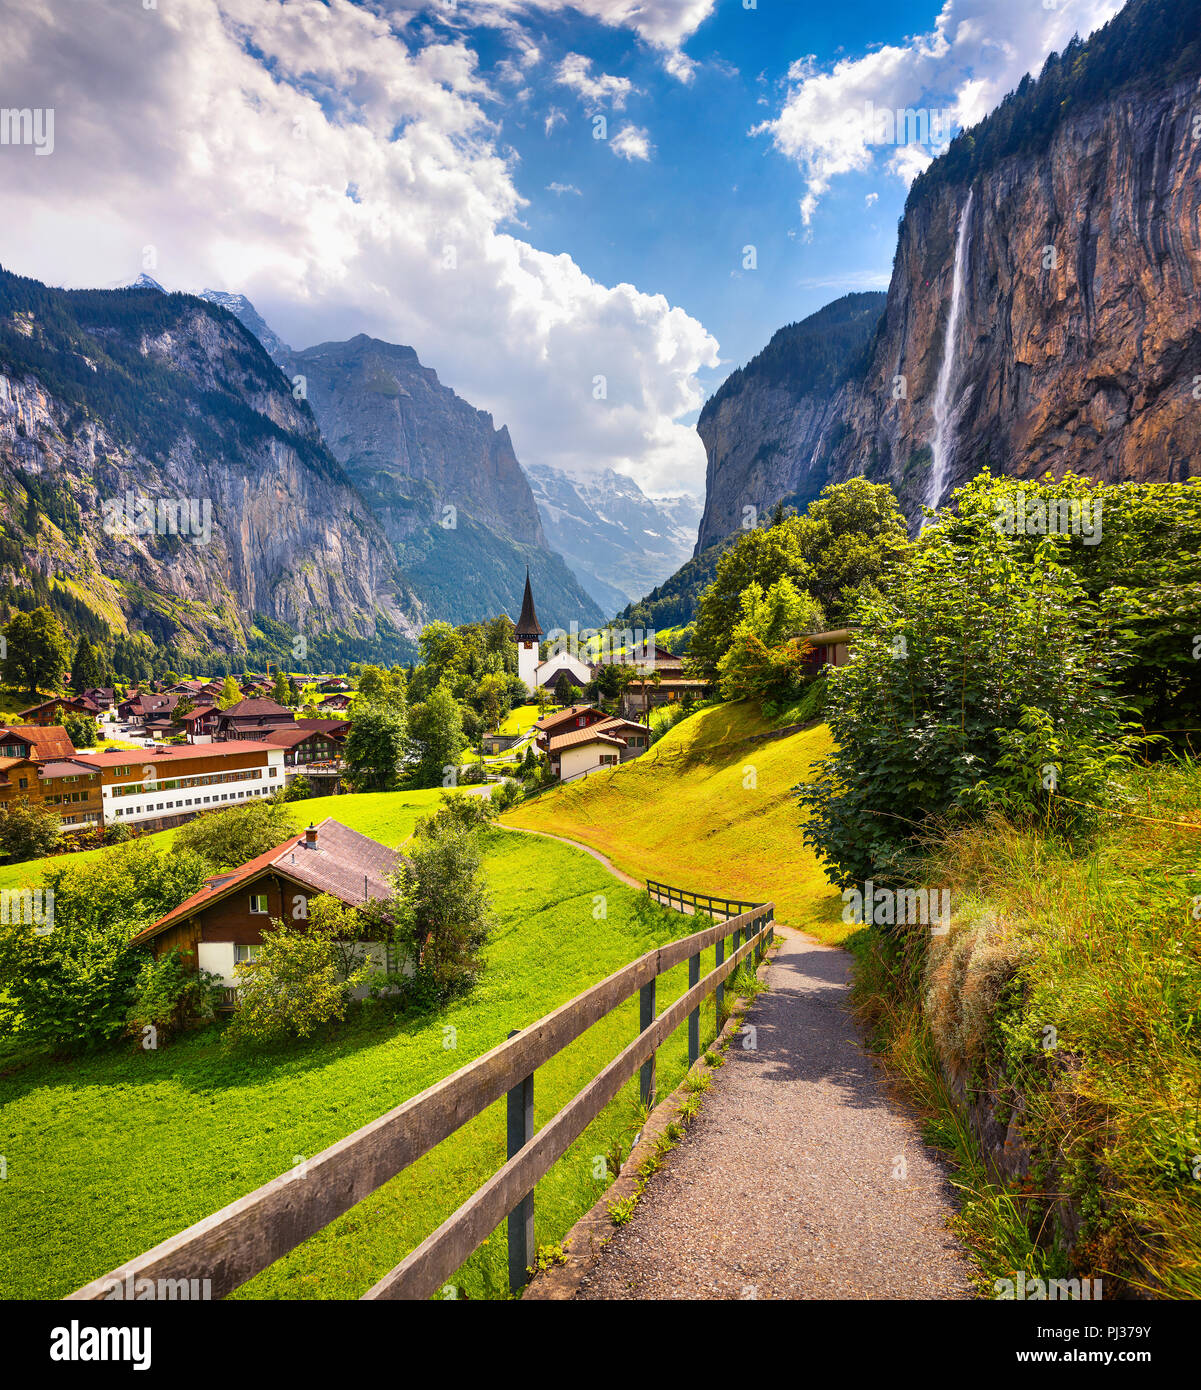 Colorful Summer View Of Lauterbrunnen Village Beautiful Outdoor Scene In Swiss Alps Bernese Oberland In The Canton Of Bern Switzerland Europe